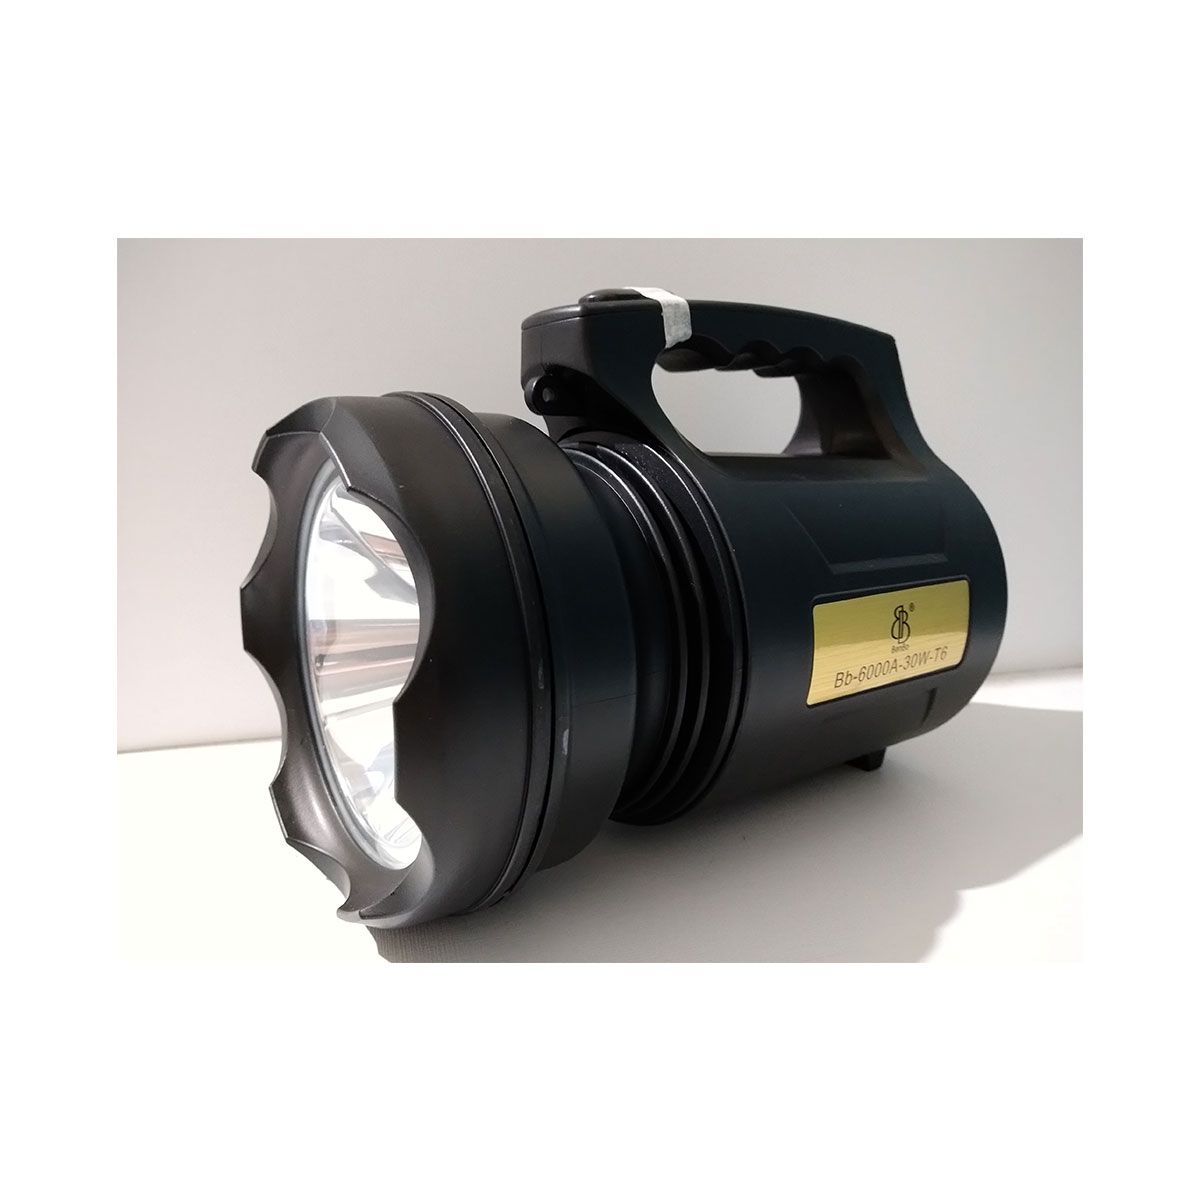 Lanterna holofote led recarregável bb 6000a 30w t6